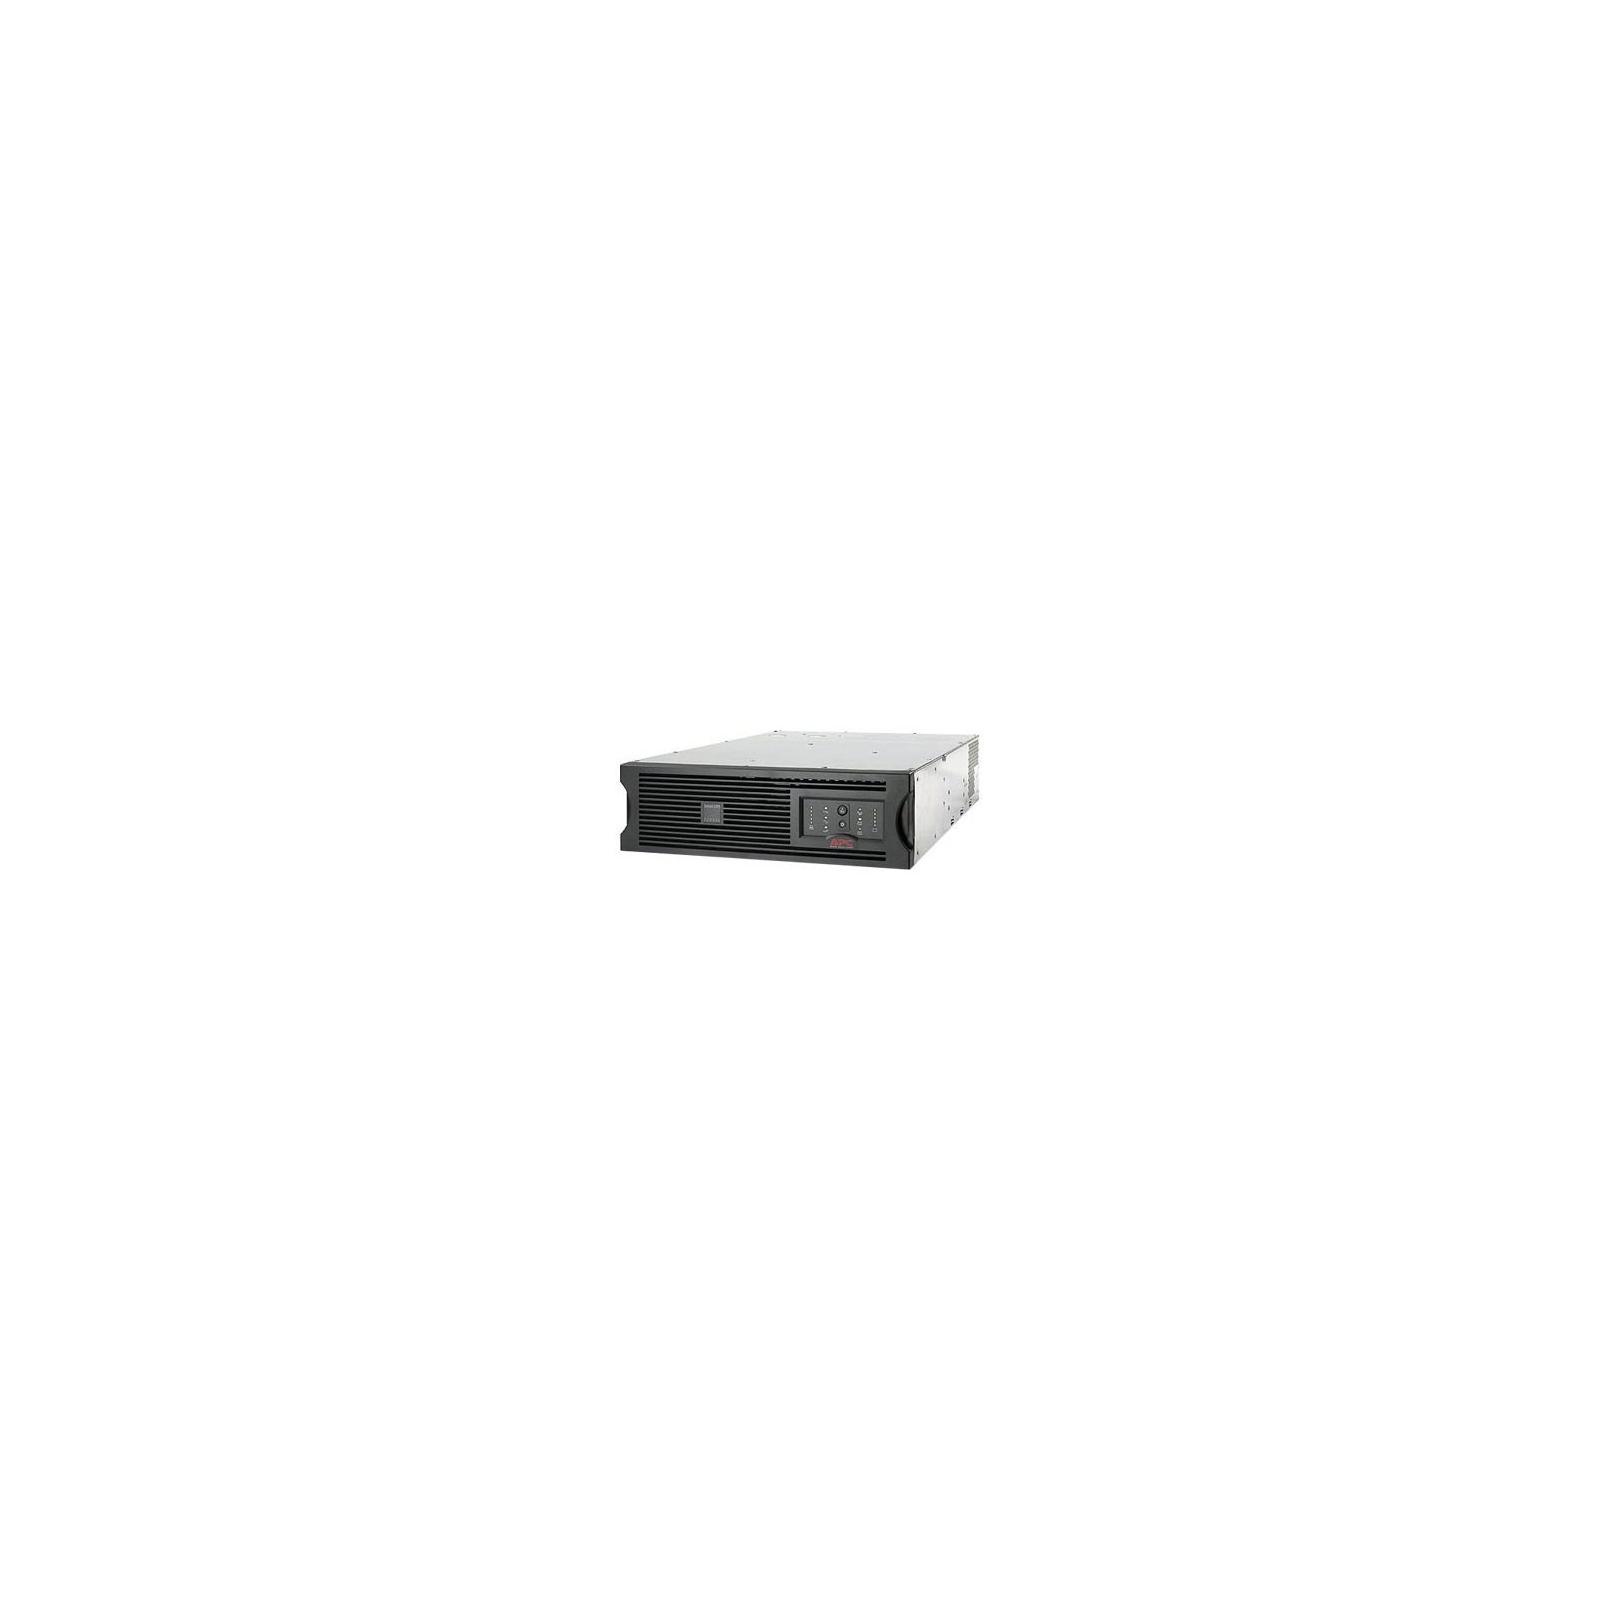 Батарея к ИБП Smart-UPS XL 2200/ 3000, RM (3U) APC (SUA48RMXLBP3U) изображение 2